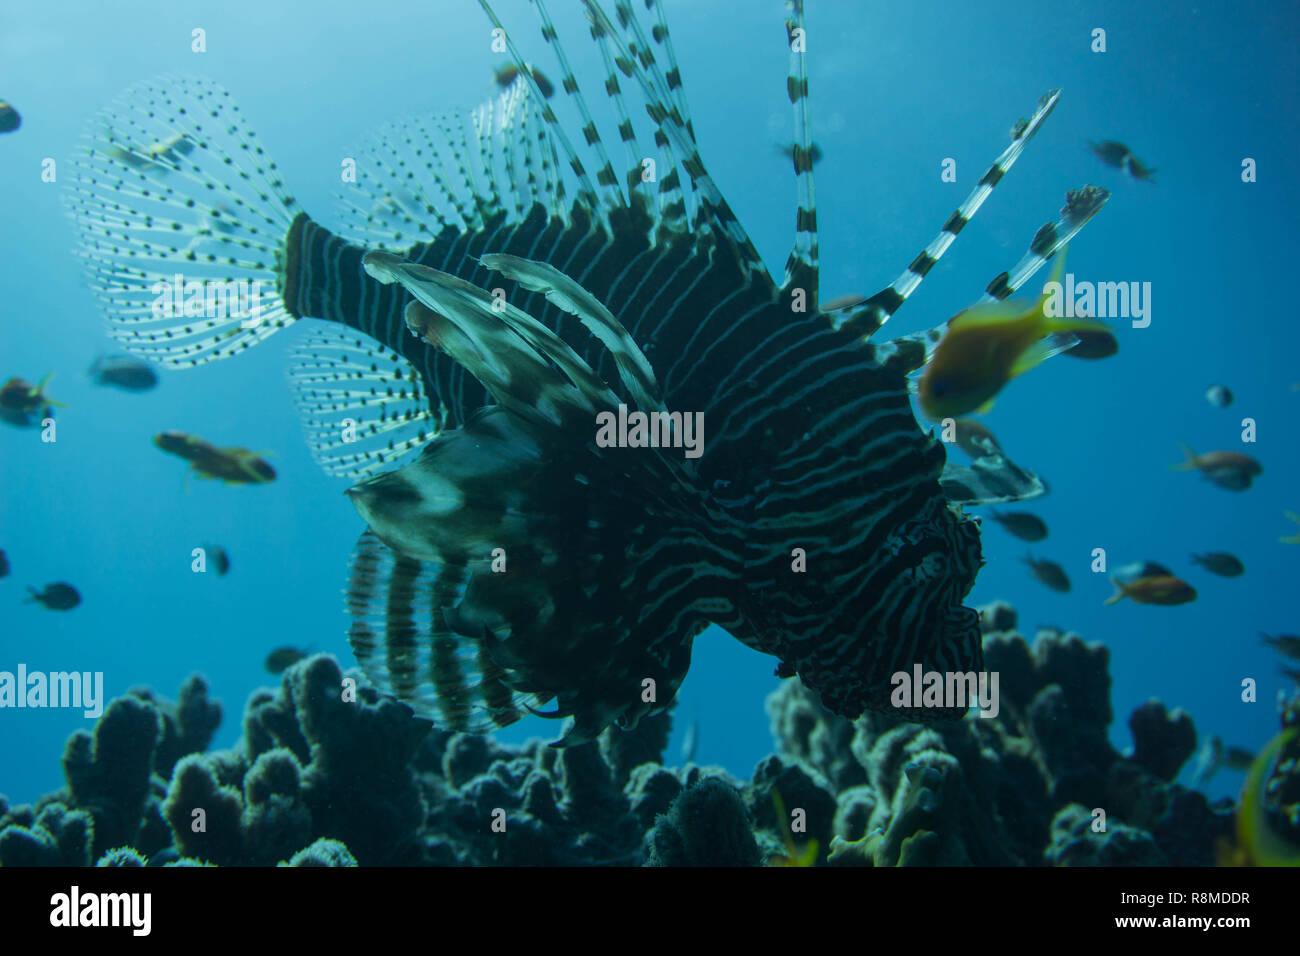 Viele Rotfeuerfische im Roten Meer entdeckt. - Stock Image